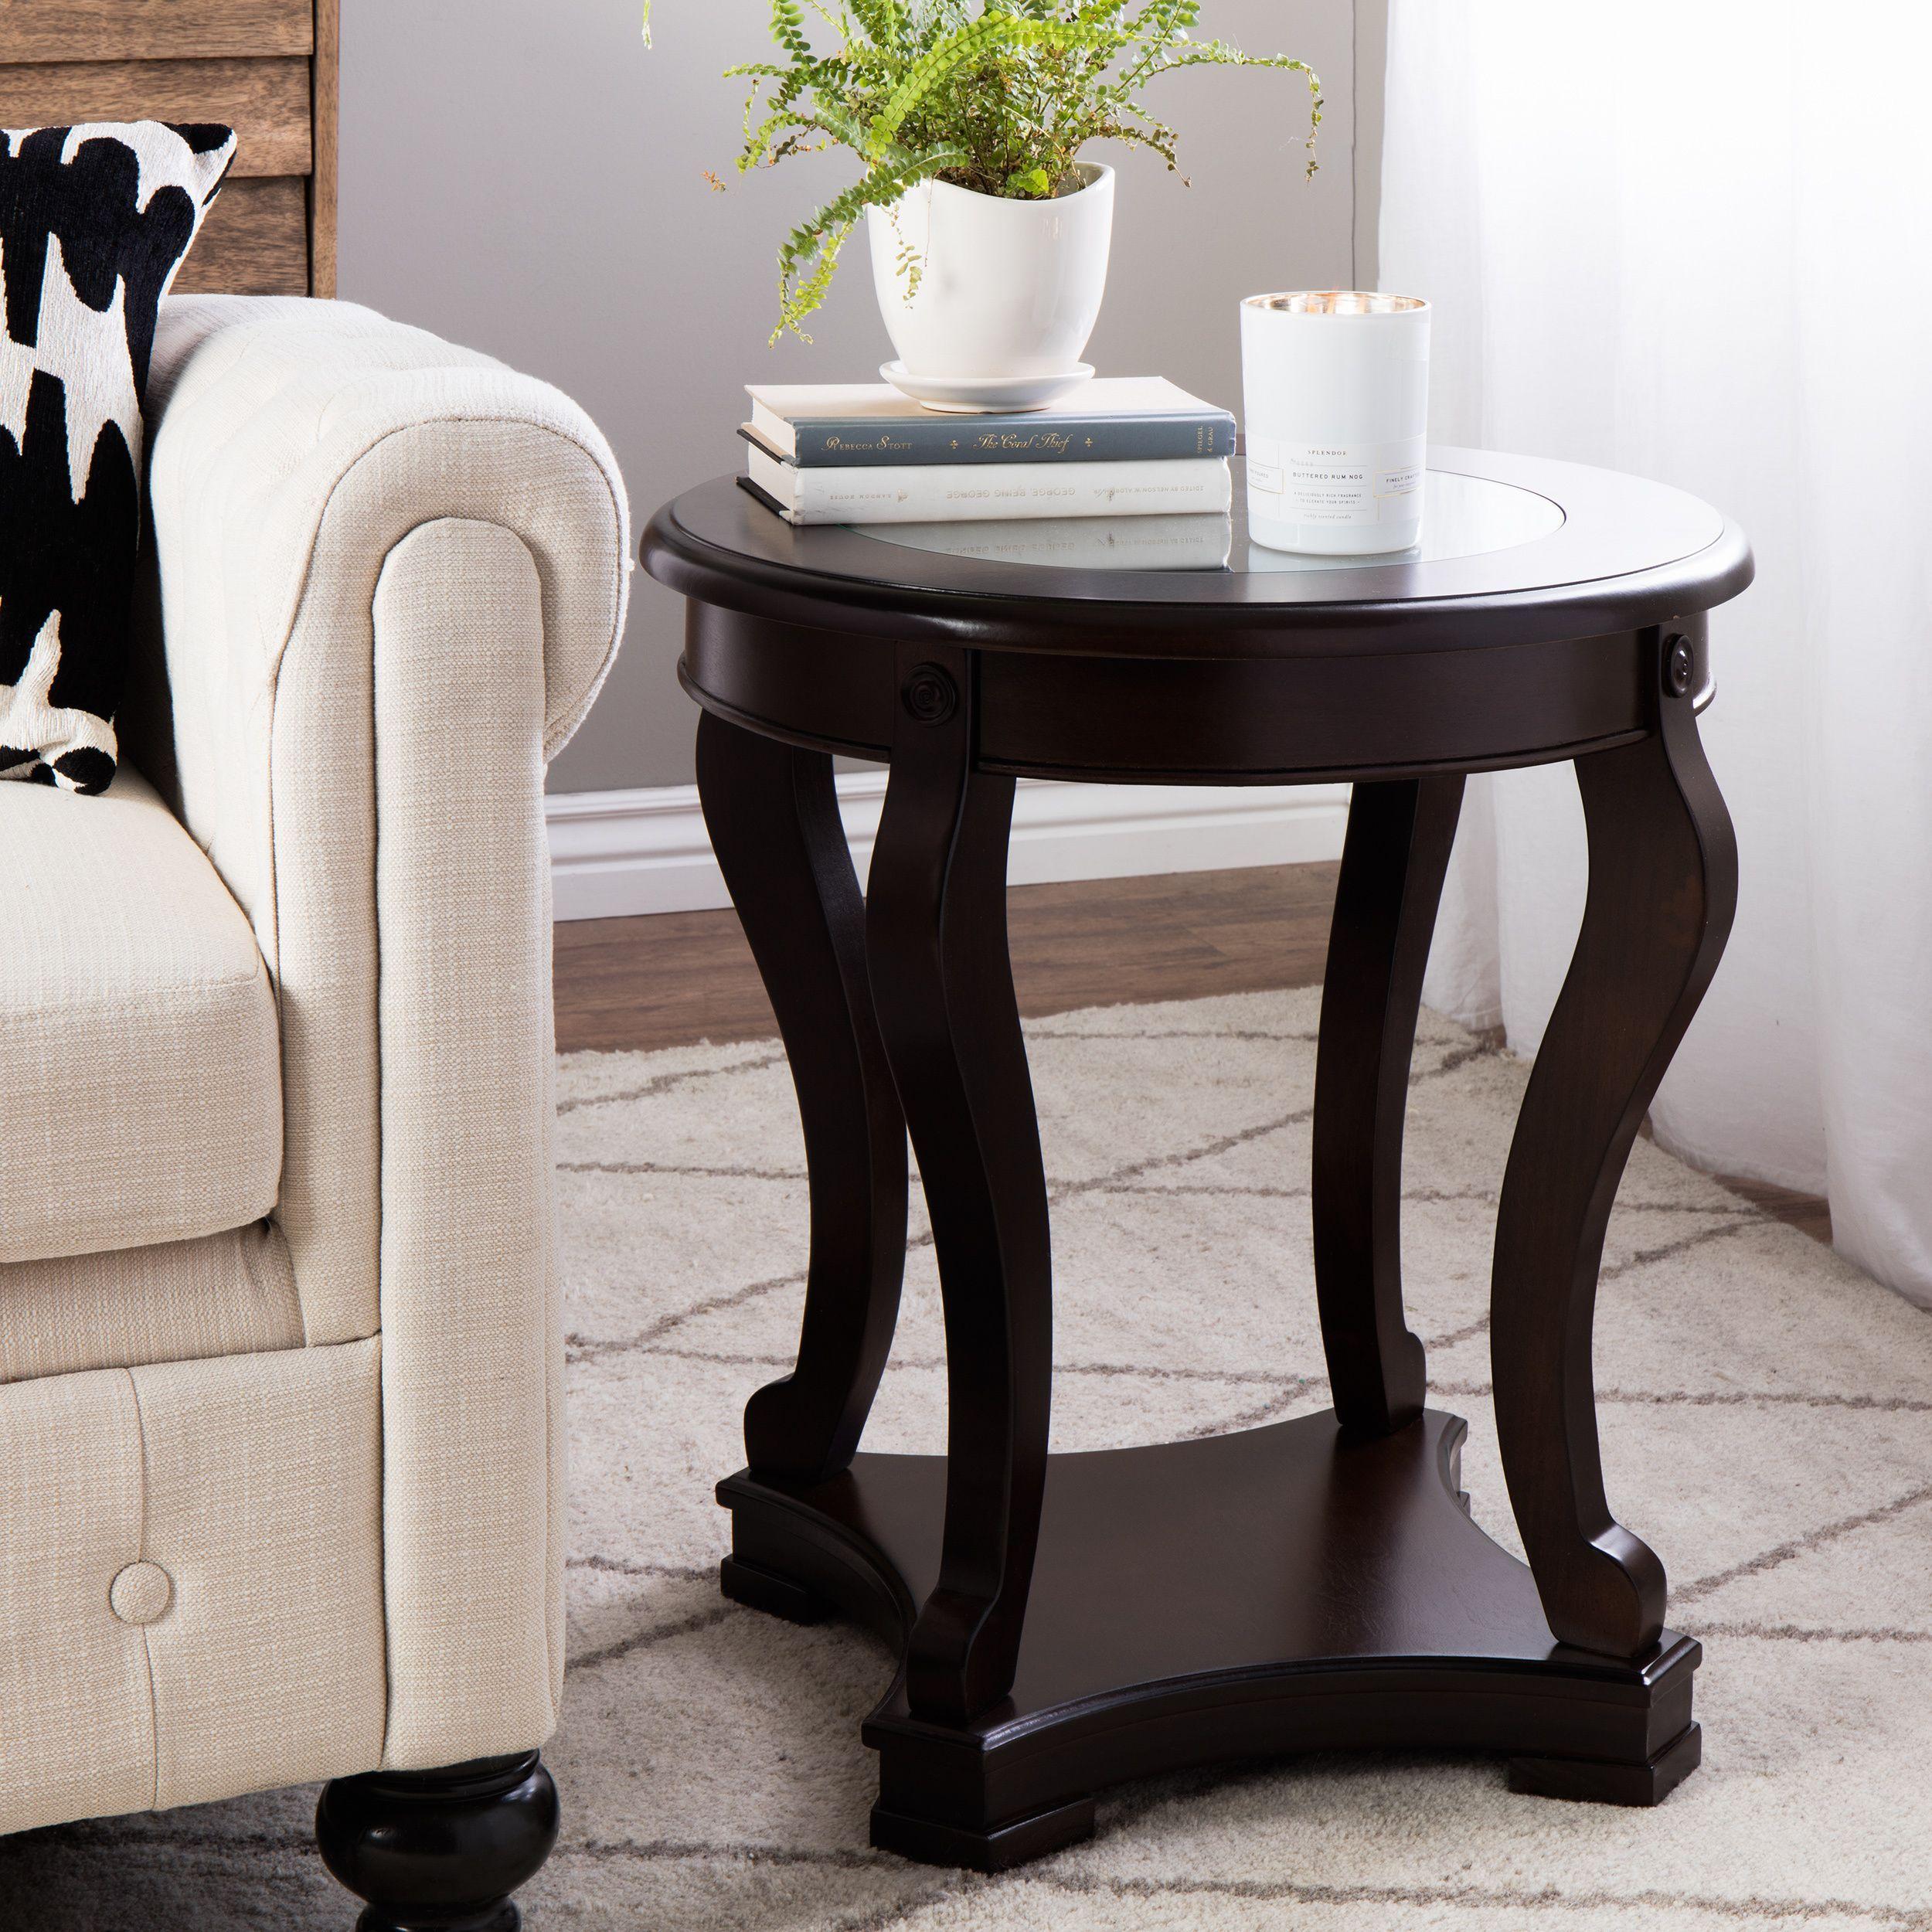 Copper Grove Geurts Espresso End Table Espresso End Table End Tables Furniture